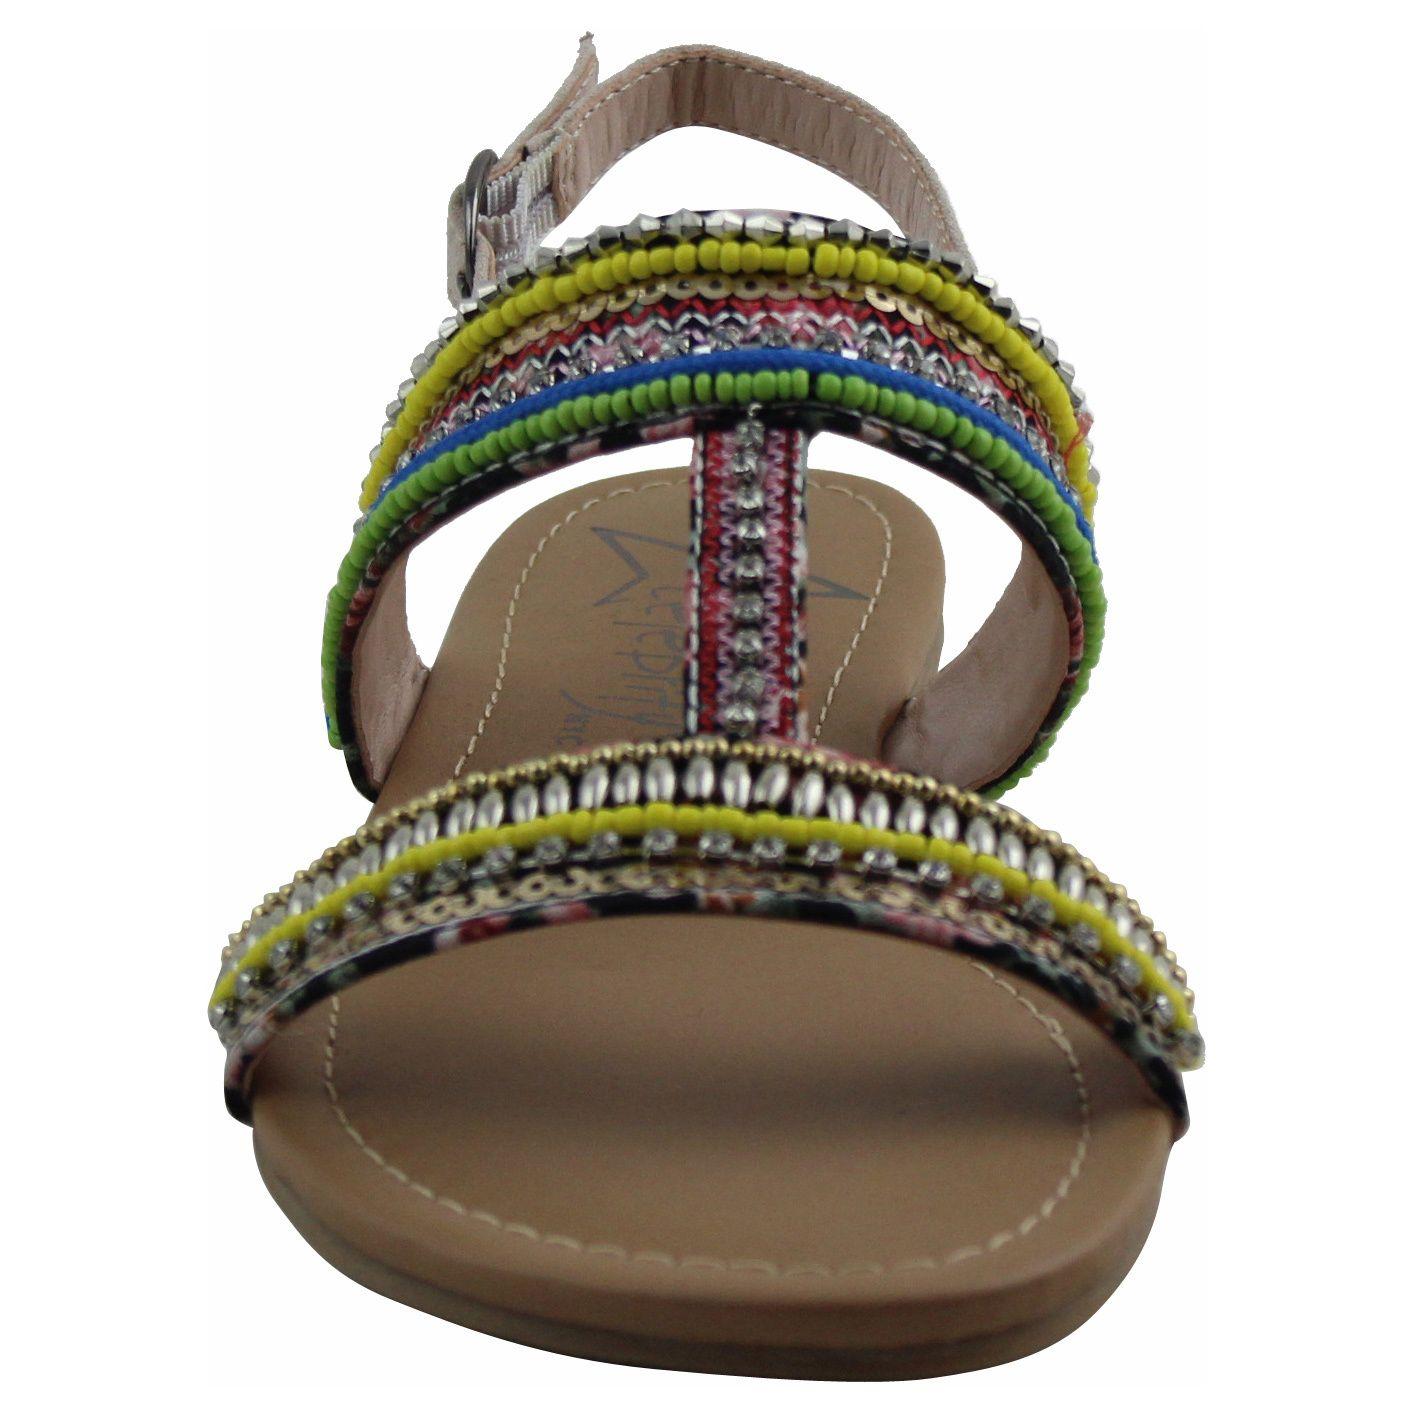 Women's 'Cindy' Multicolor Beaded Sandals